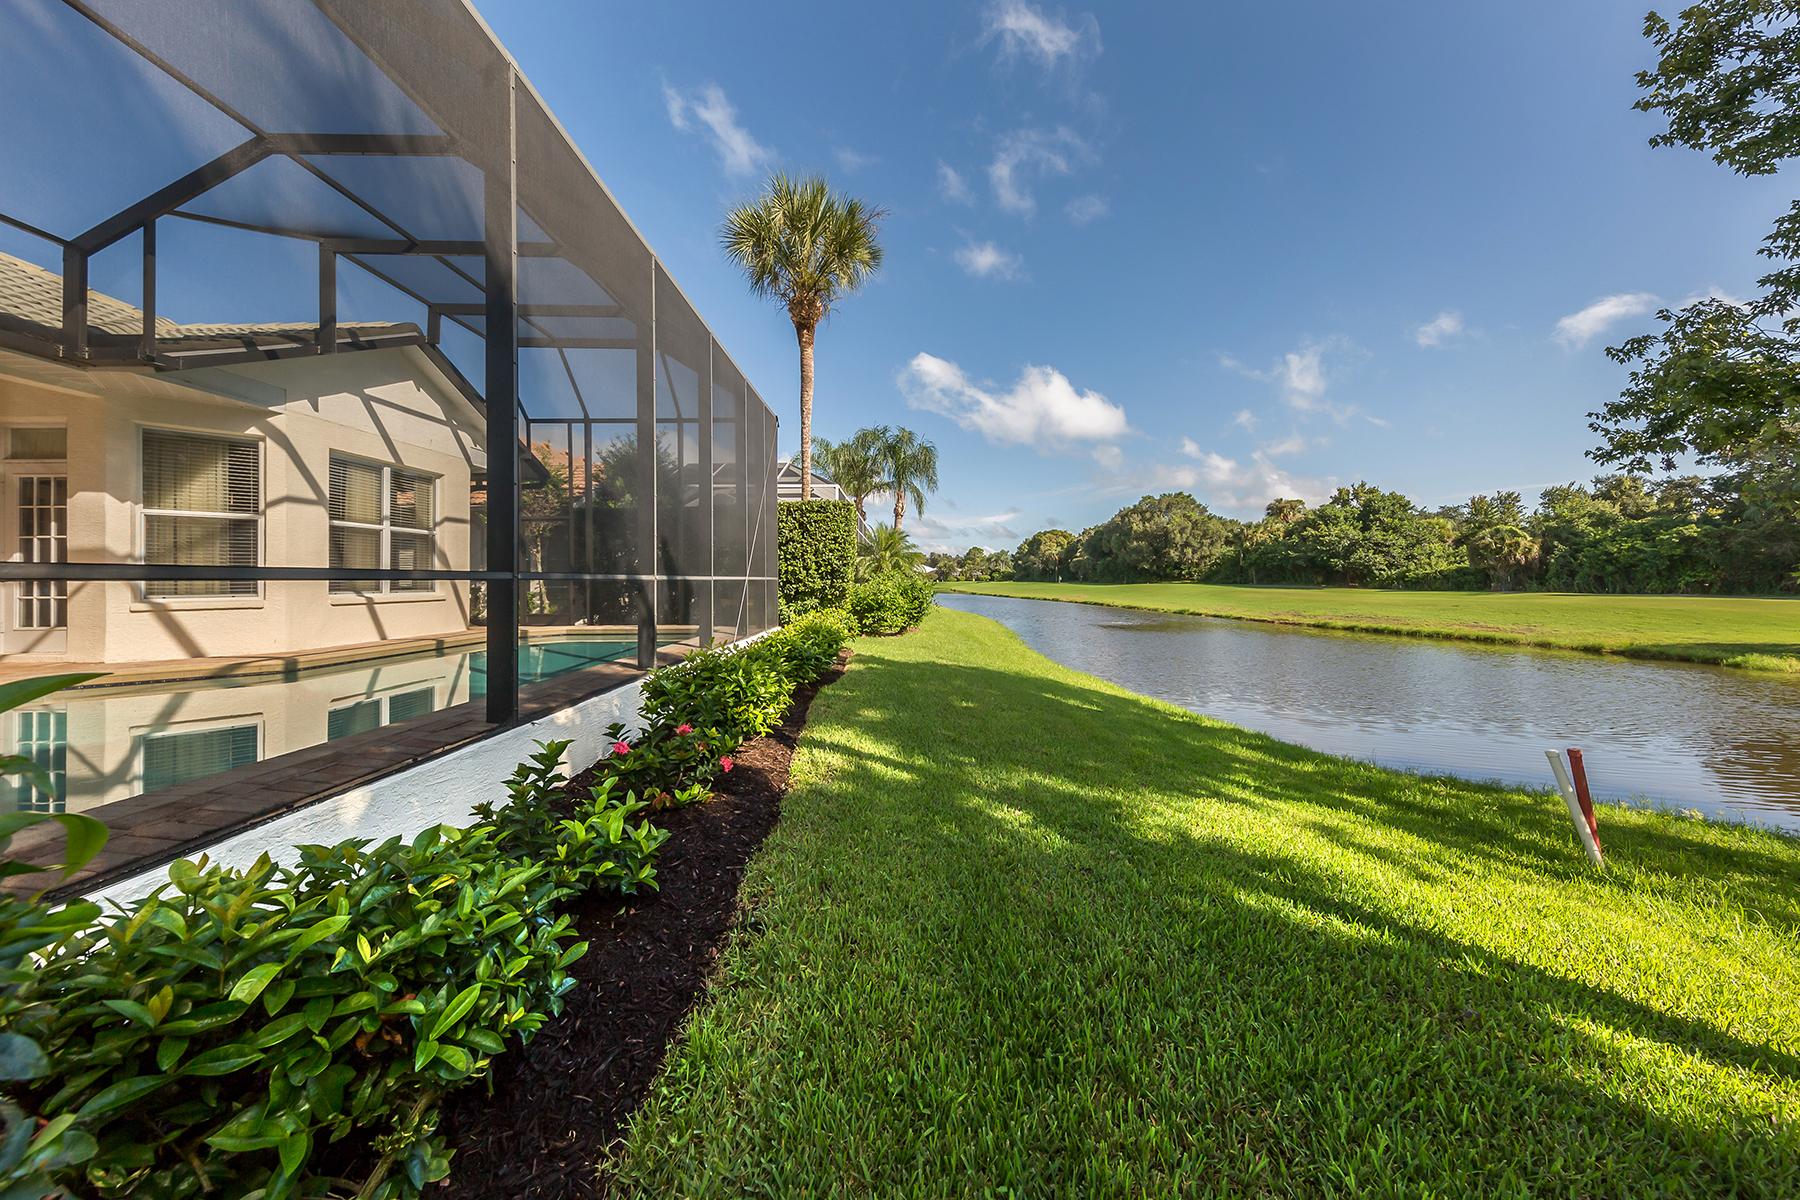 Additional photo for property listing at 576 Sawgrass Bridge Road, ベニス, フロリダ 34292 アメリカ